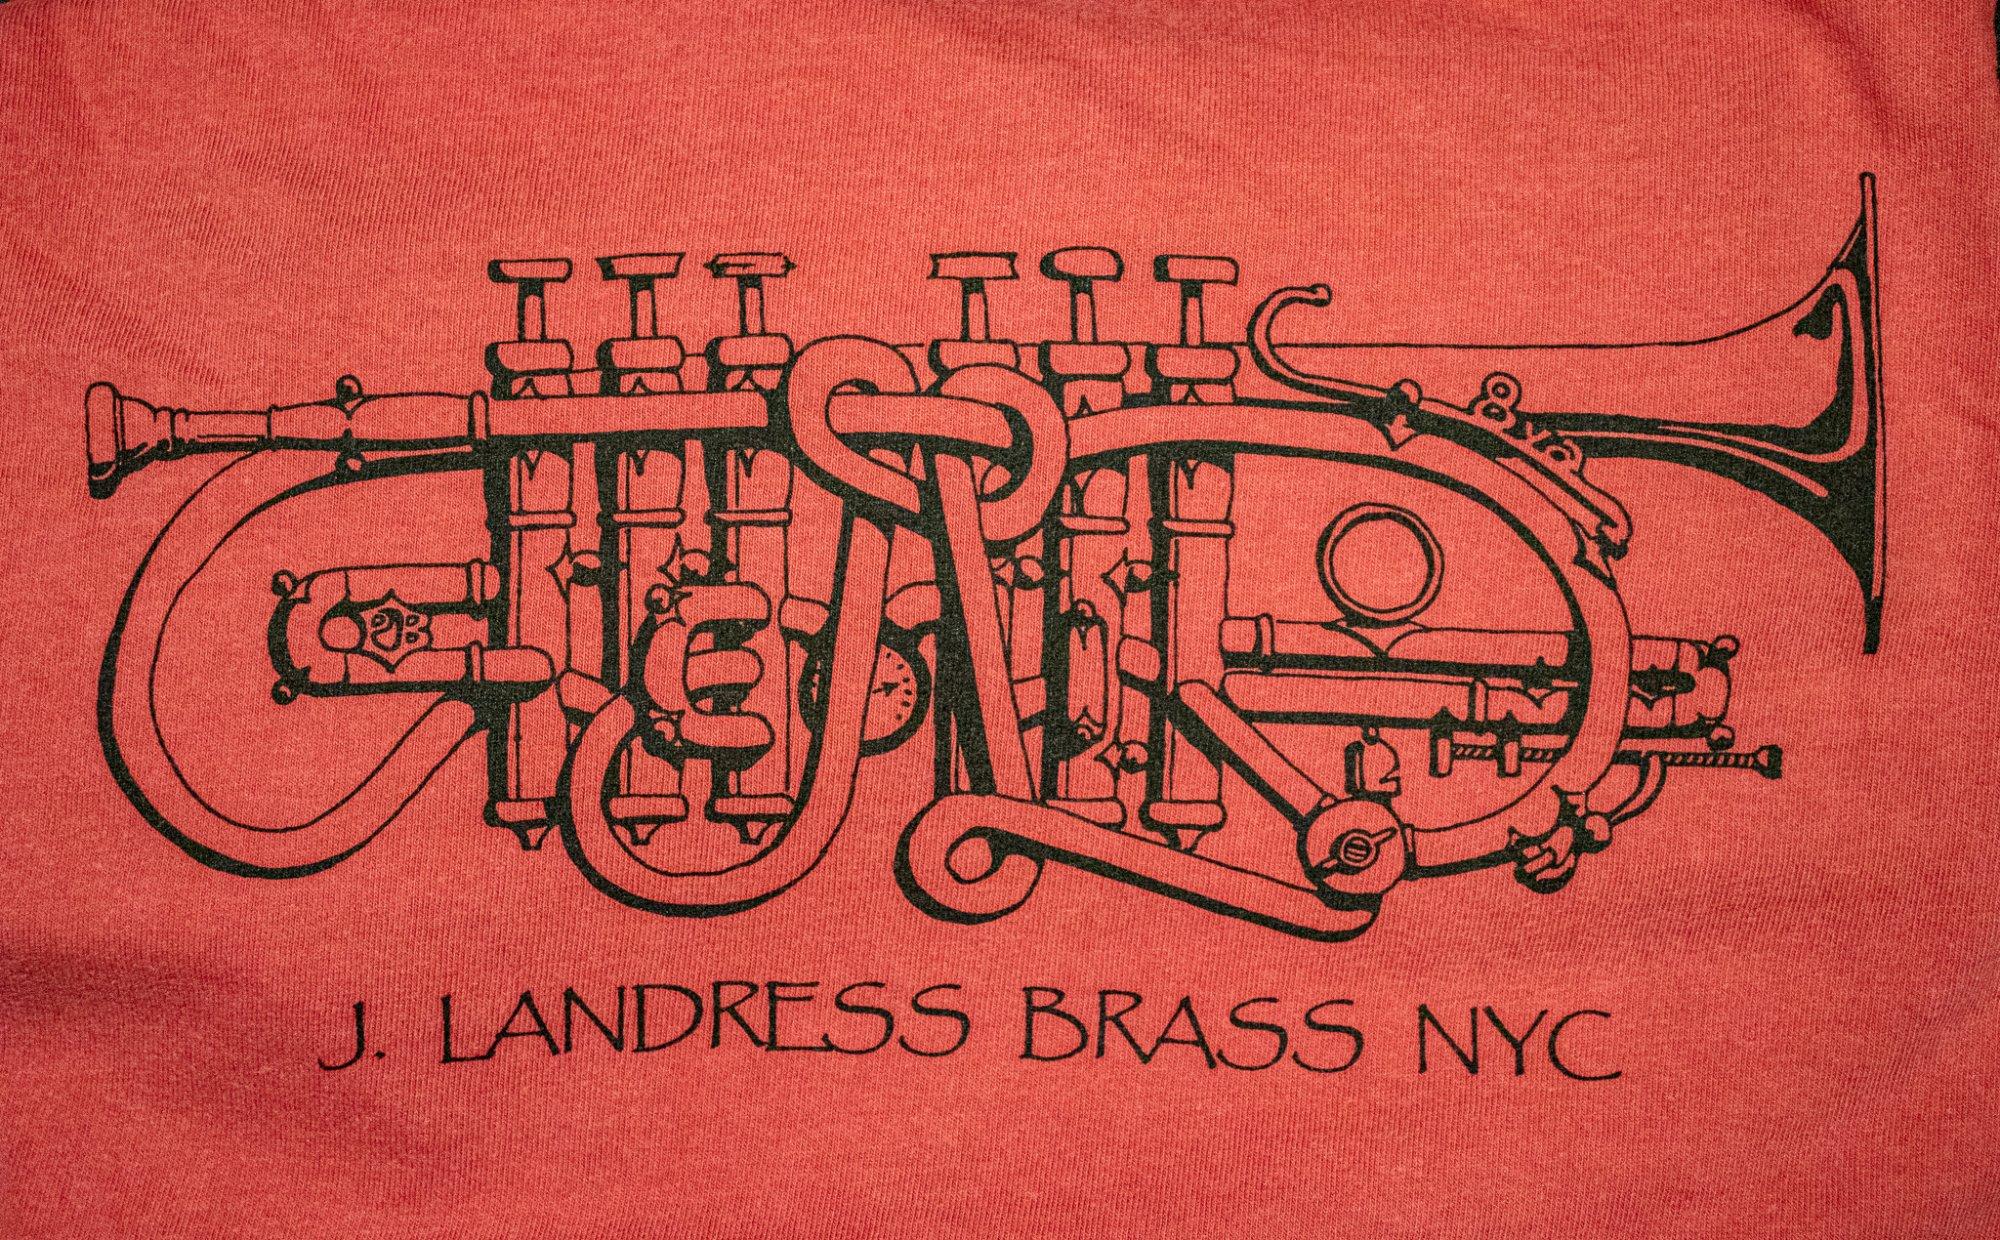 J. Landress Brass T-shirt Youth Sizing